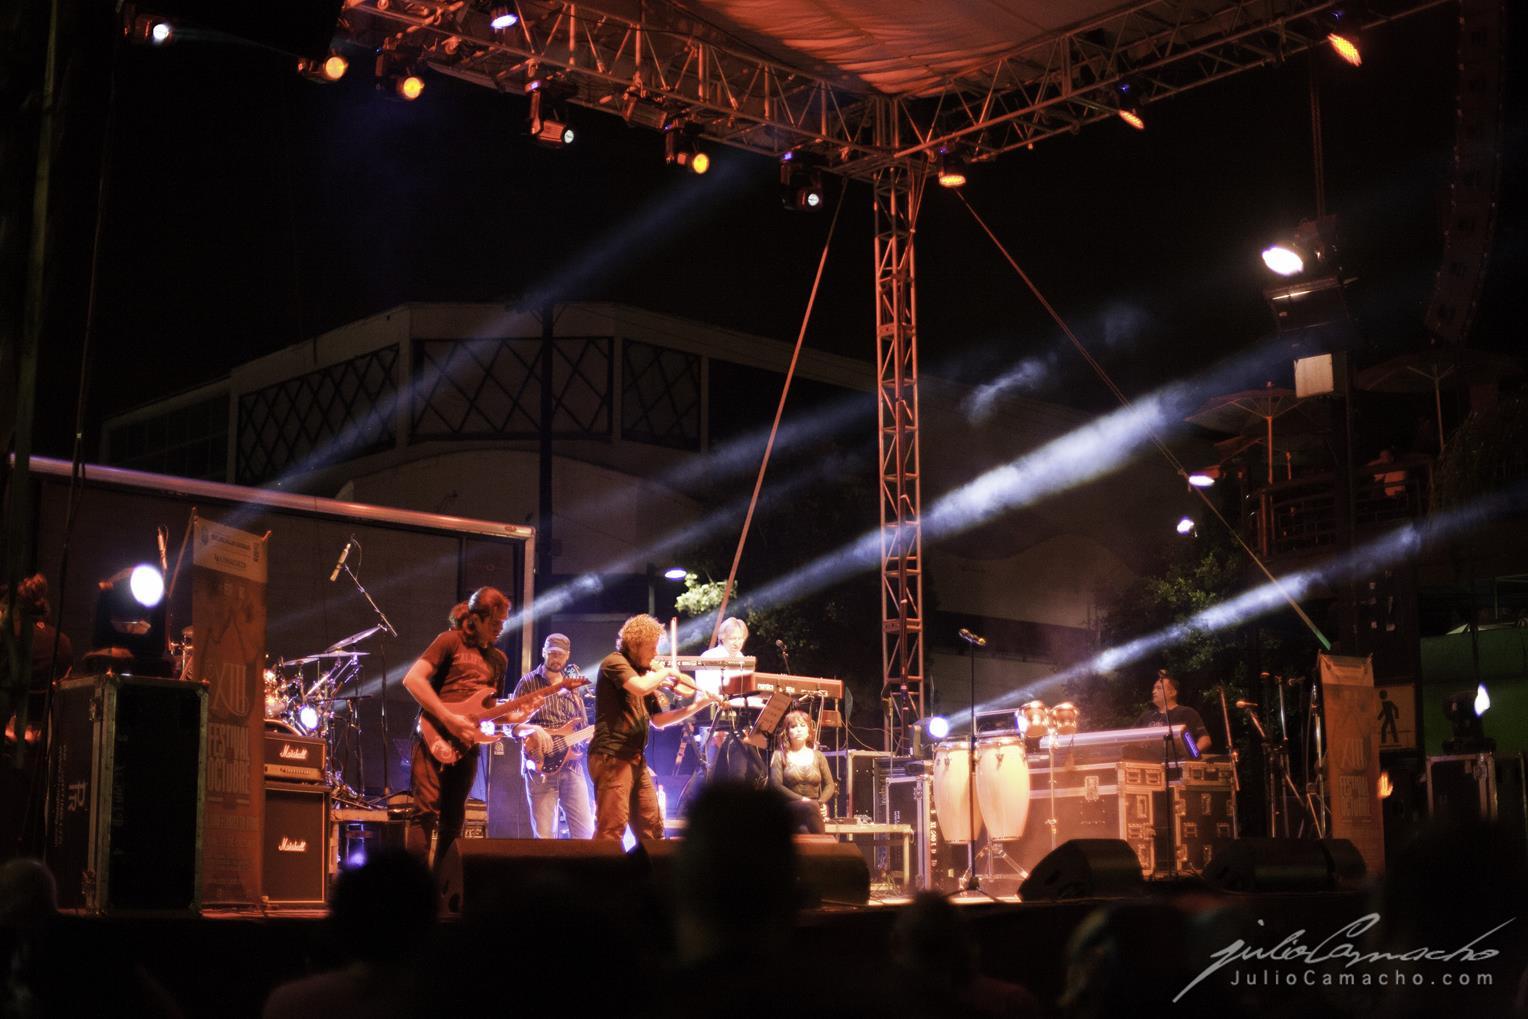 2014-10-30 31 CAST TOUR Ensenada y Tijuana - 1511 - www.Juli (Copy).jpg